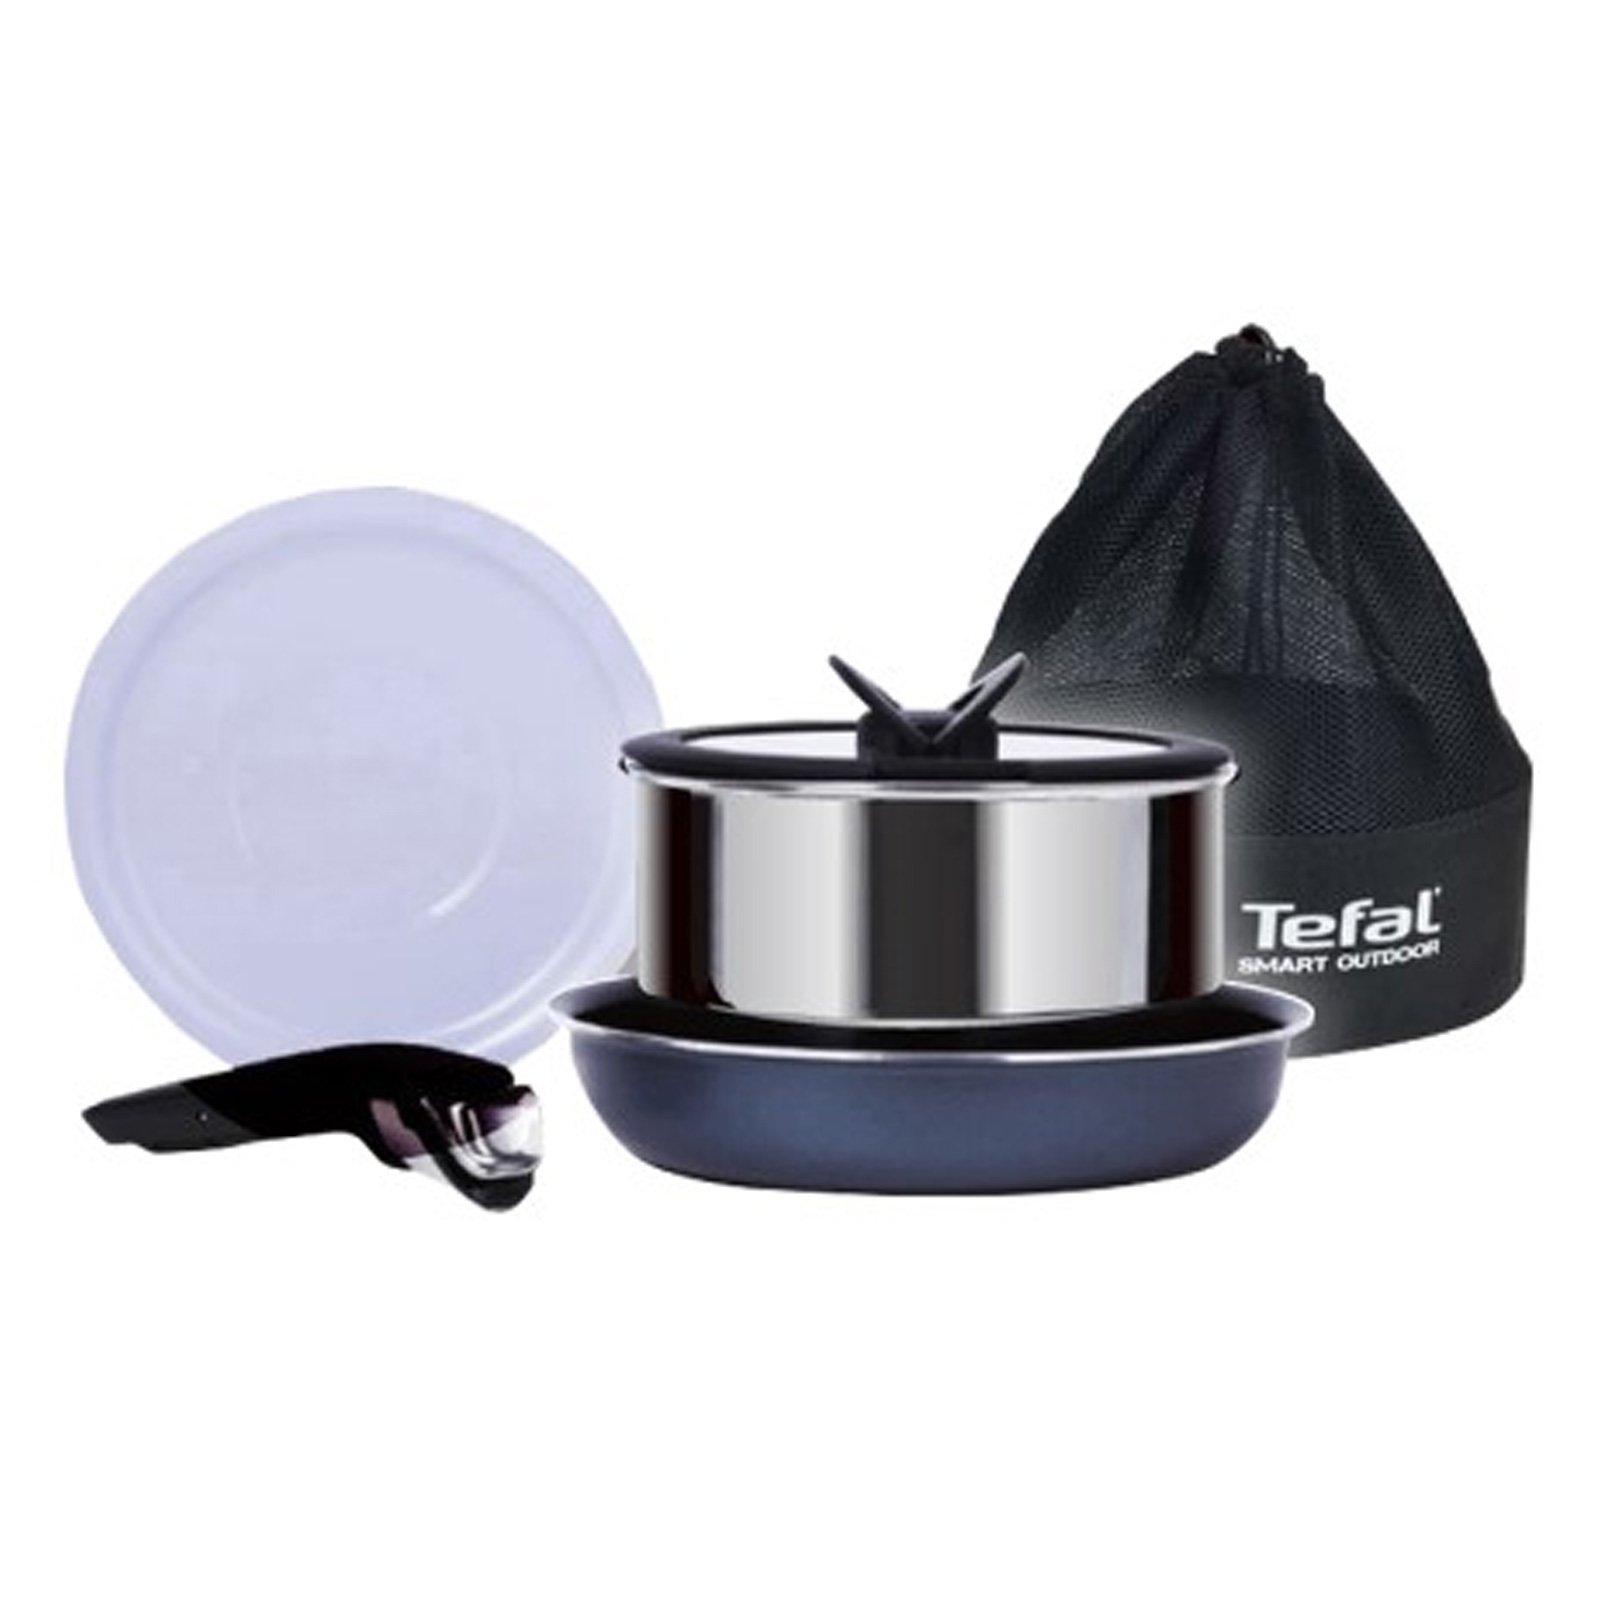 Tefal Smart Outdoor Magic Hands Camping 5P Set Stainless Pot 18cm Fry Pan 22cm